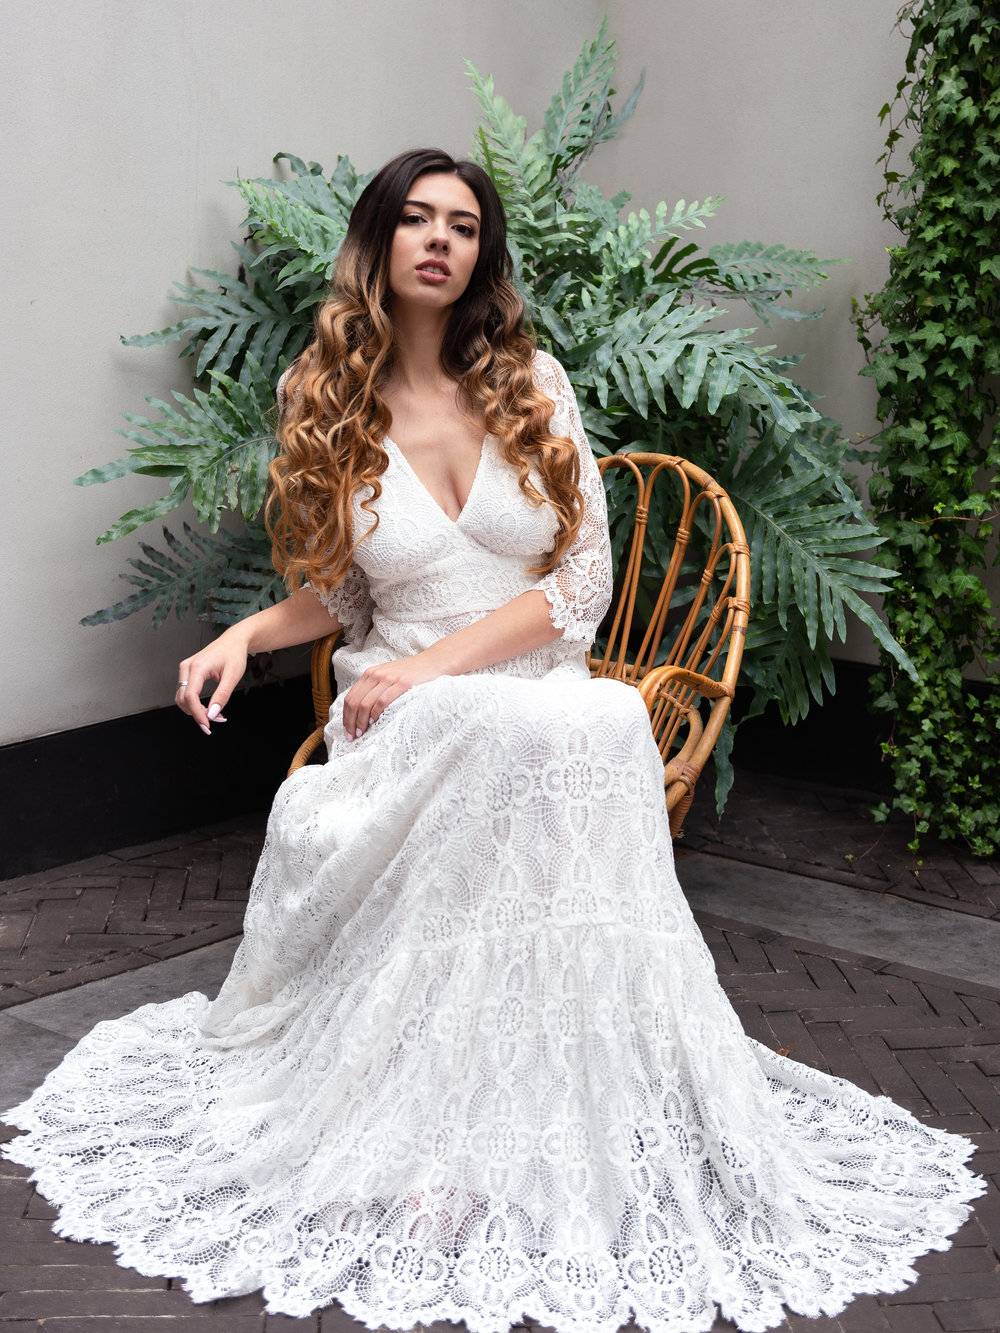 styled-bridal-8.jpg